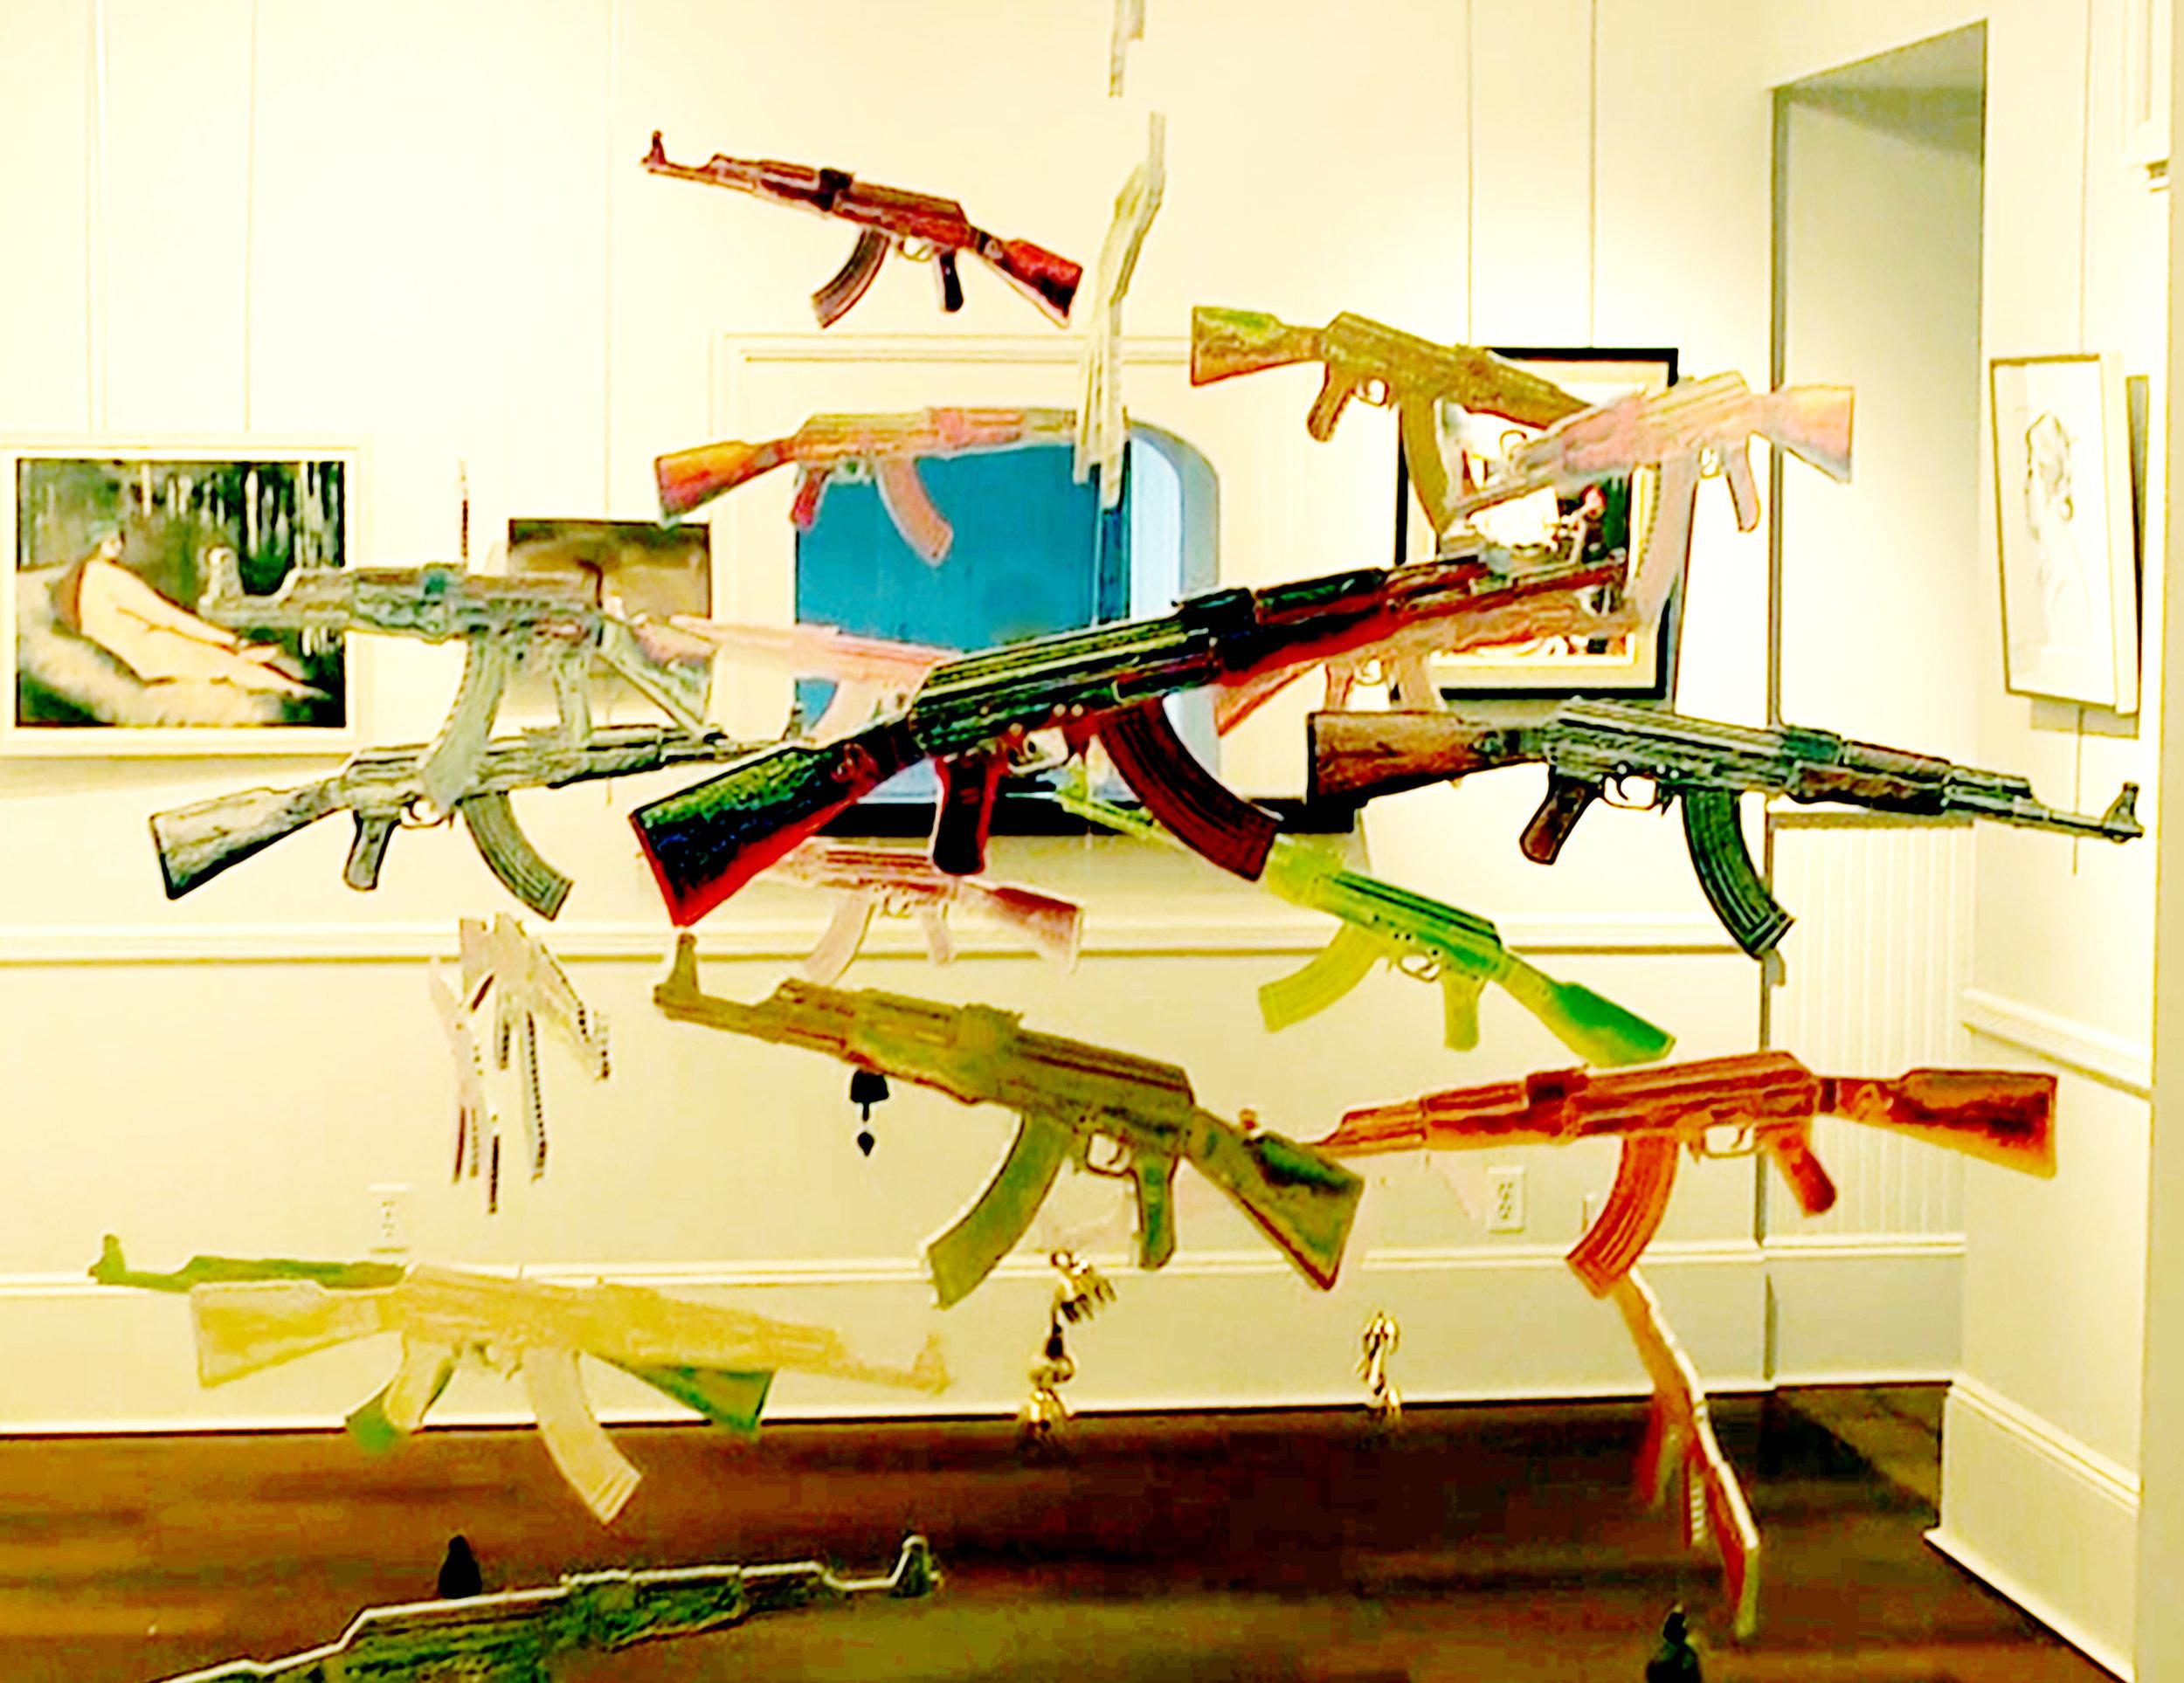 AK 47 Sculpture